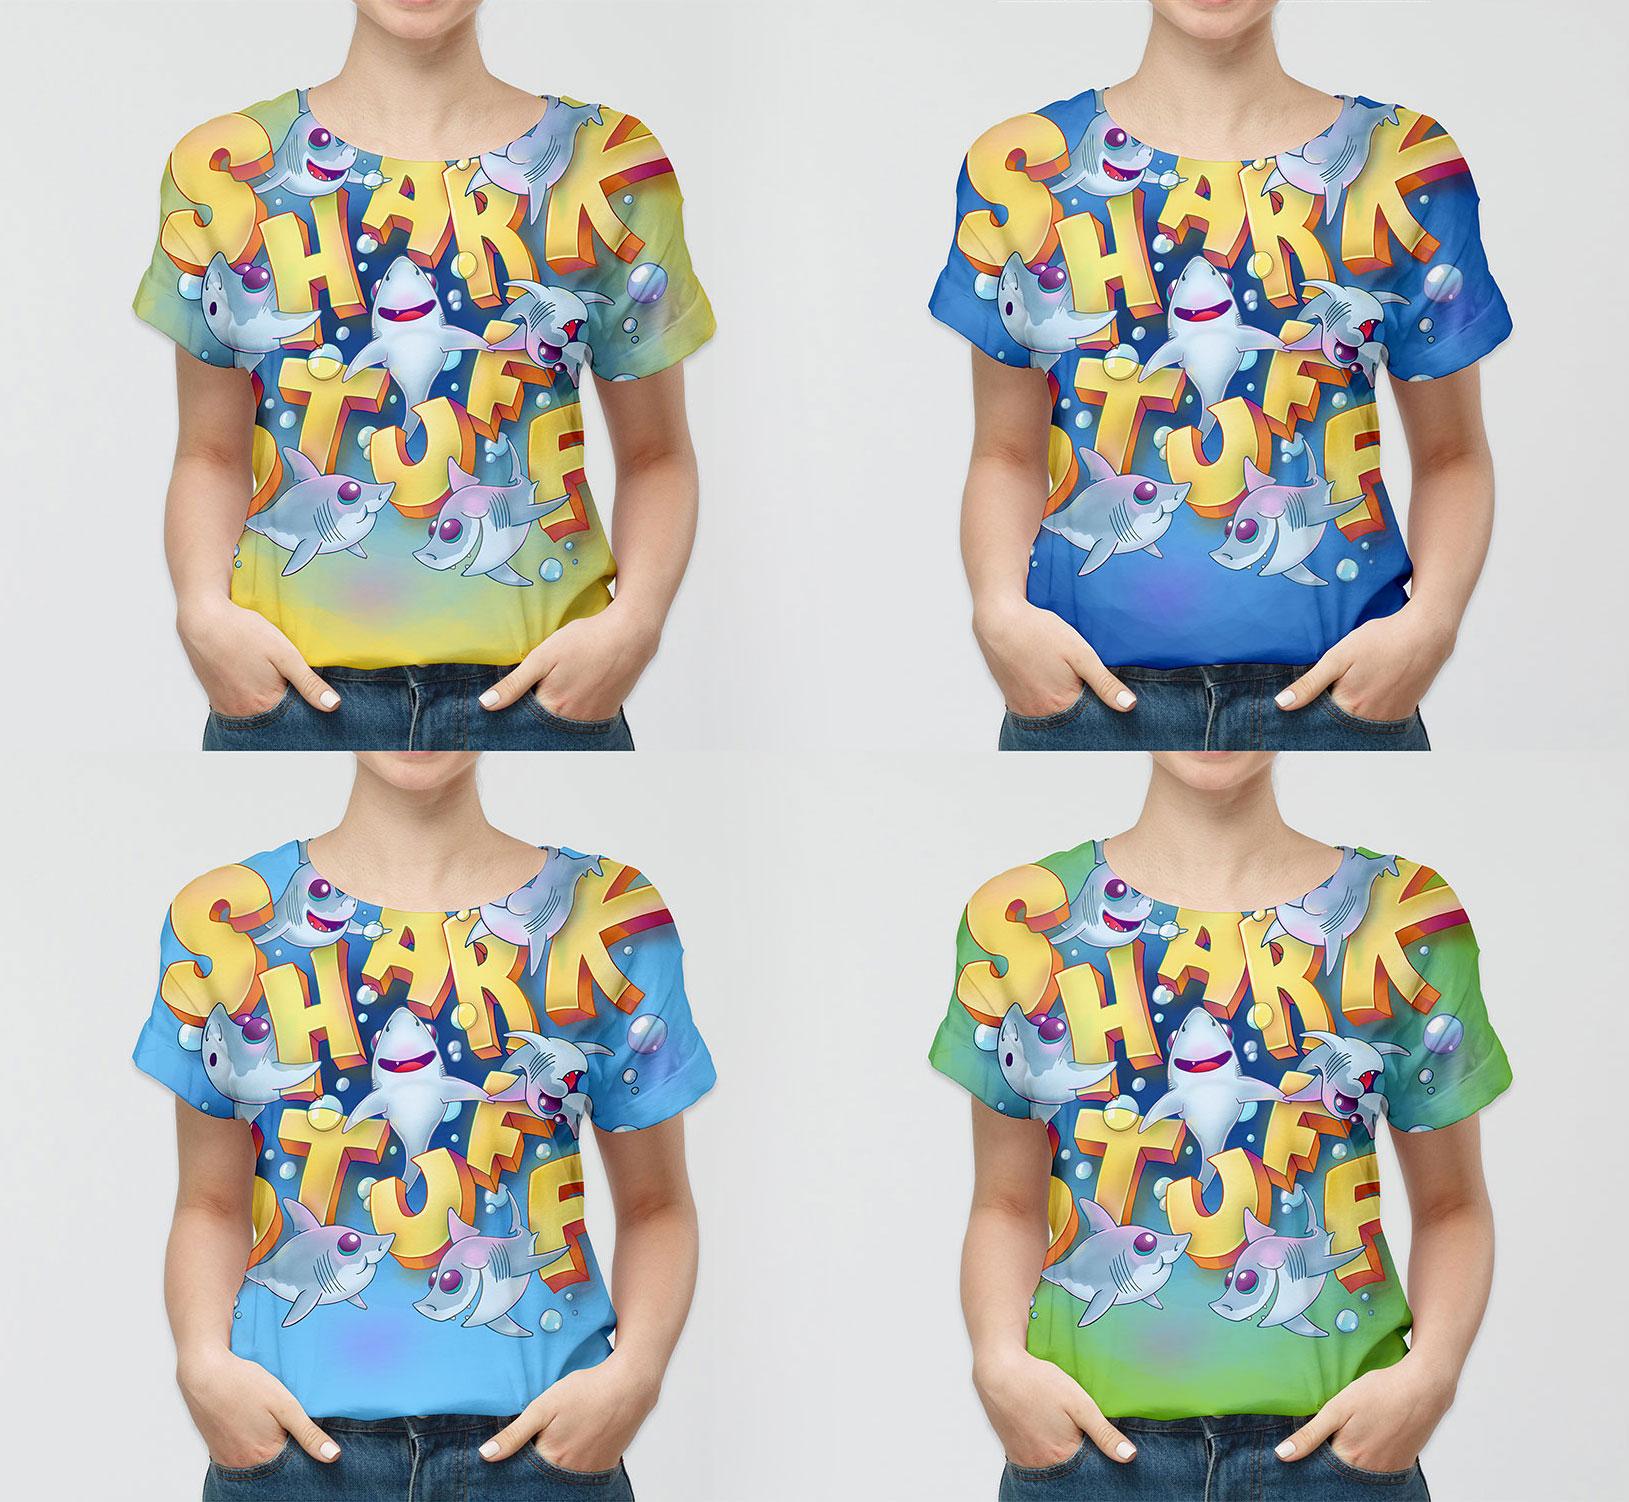 © SharkStuff - Full body T-shirt drafts